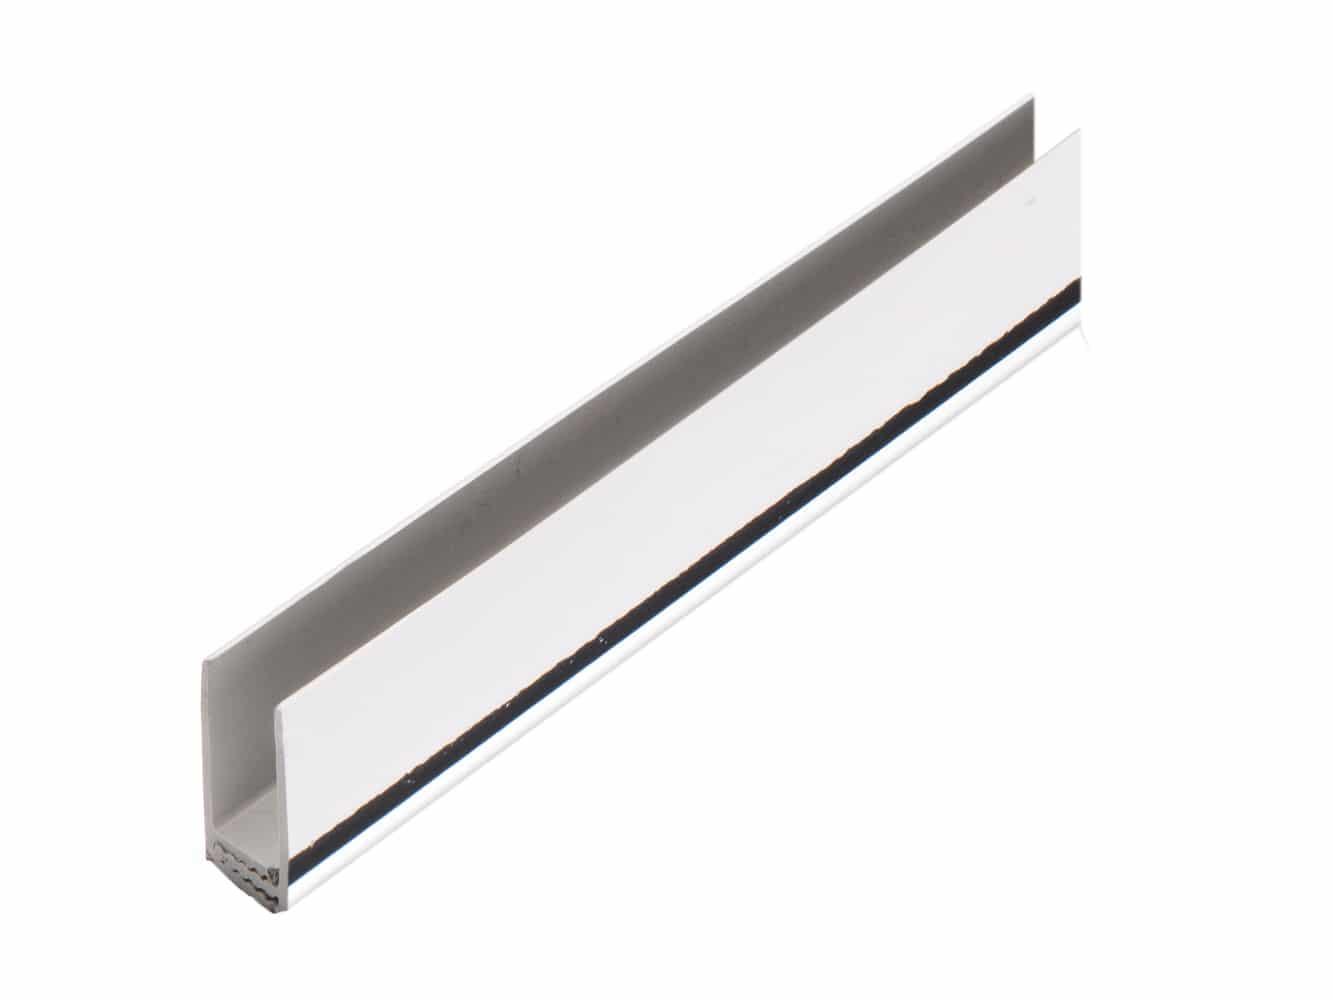 Chrome Wall Panel Trim 3mm-10mm